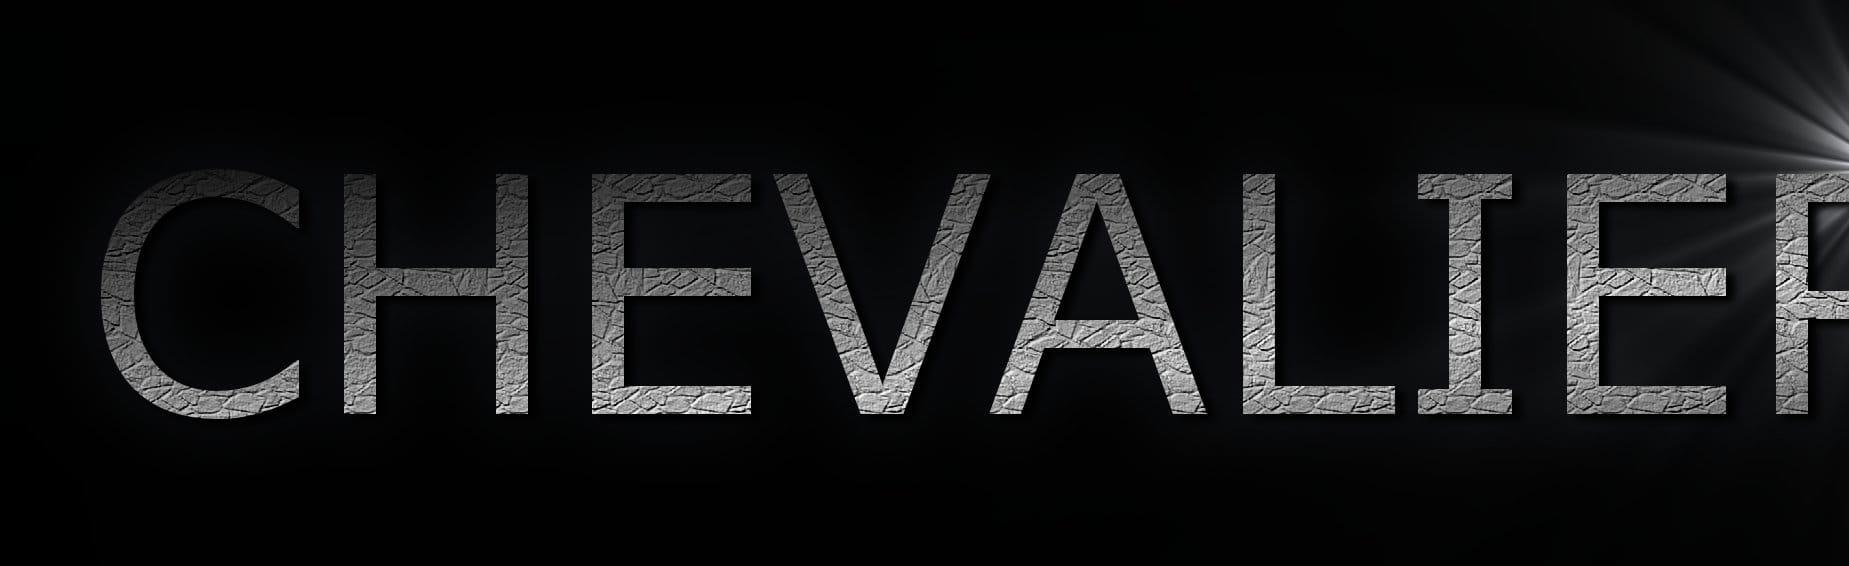 Chevaliers Savate